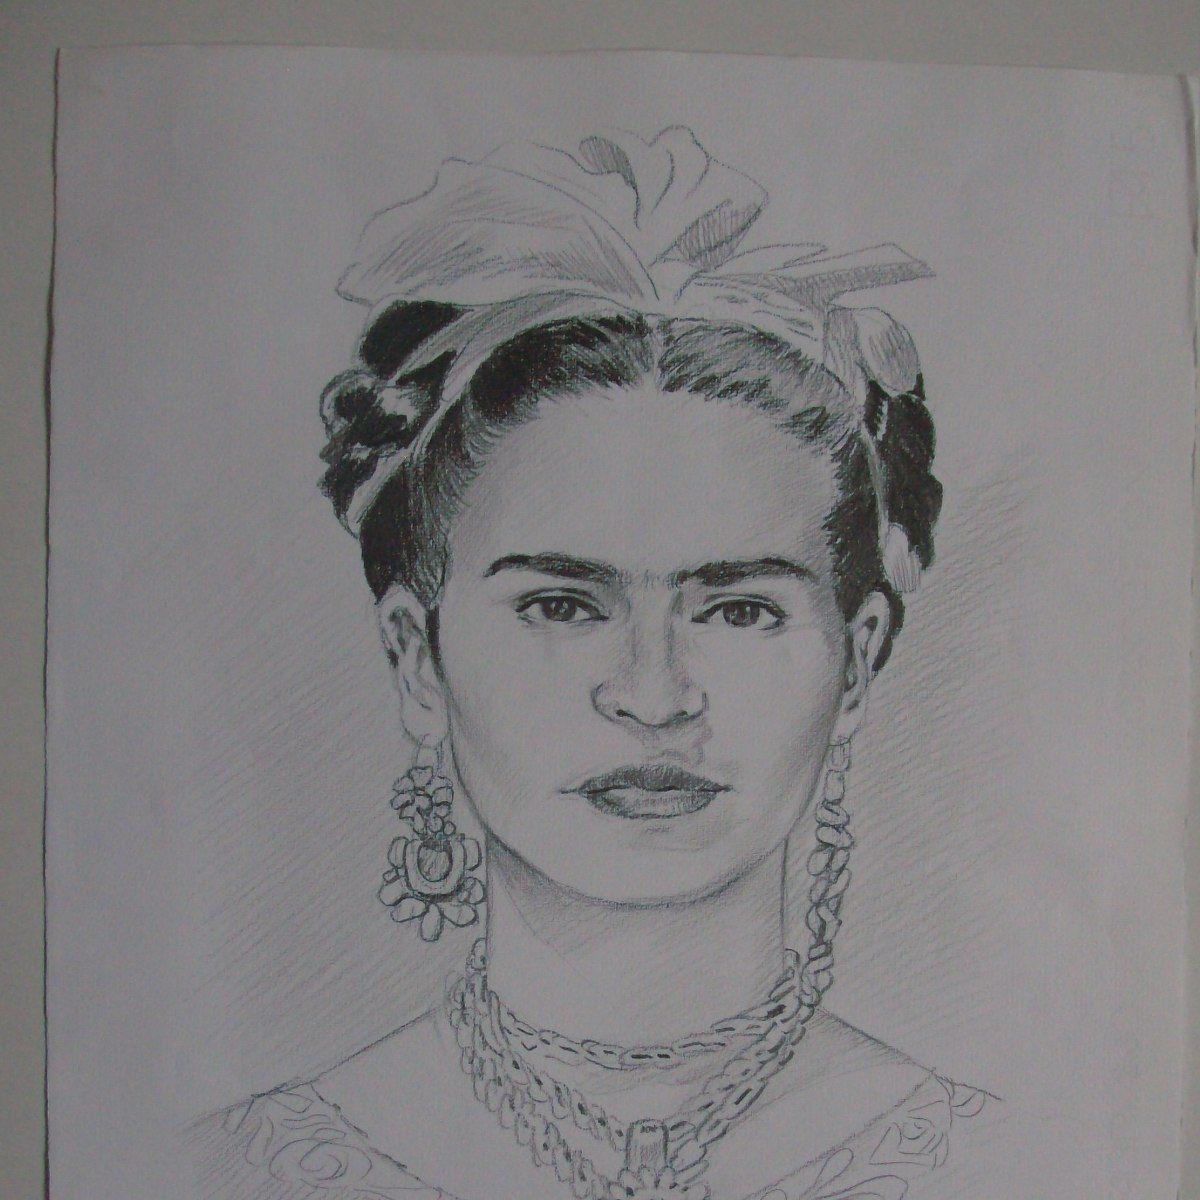 Dibujo A Lapiz Frida Kahlo Elaborado En Tlaxcala Col Part 17234 Mlm20135105645 072014 F Jpg 1200 1200